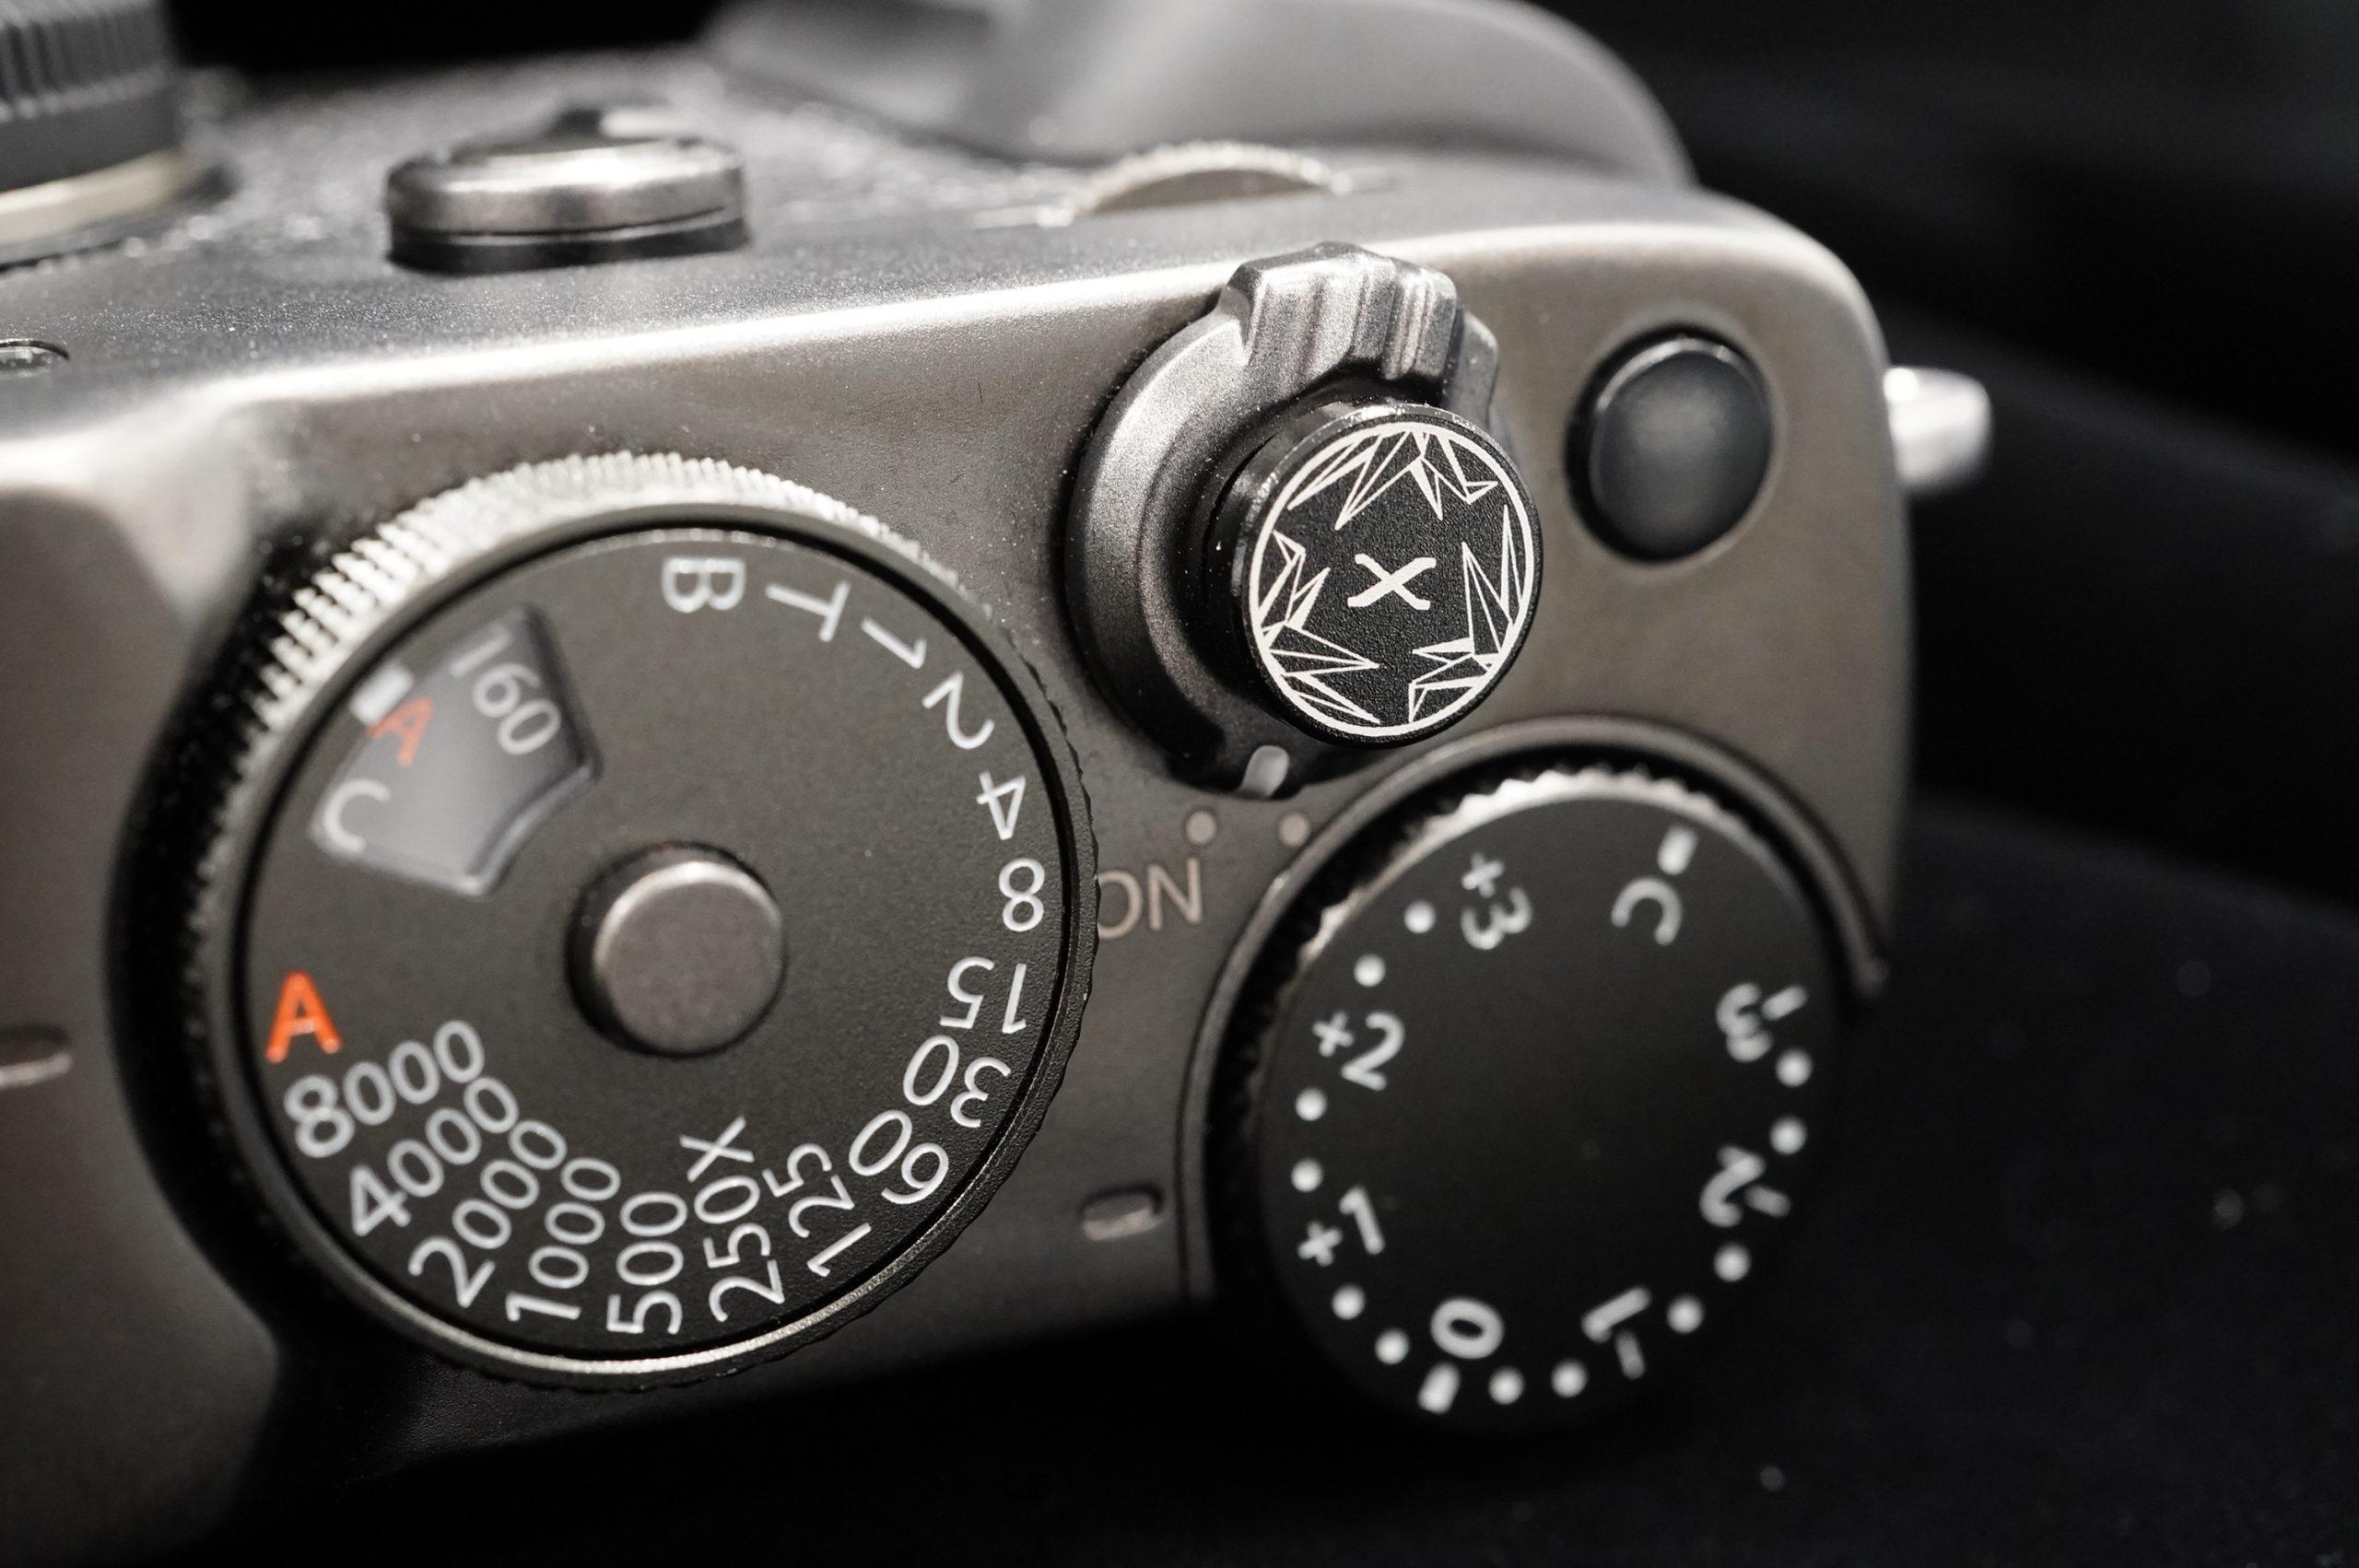 【FUJIFILM】マップカメラオリジナルレリーズボタンプレゼント